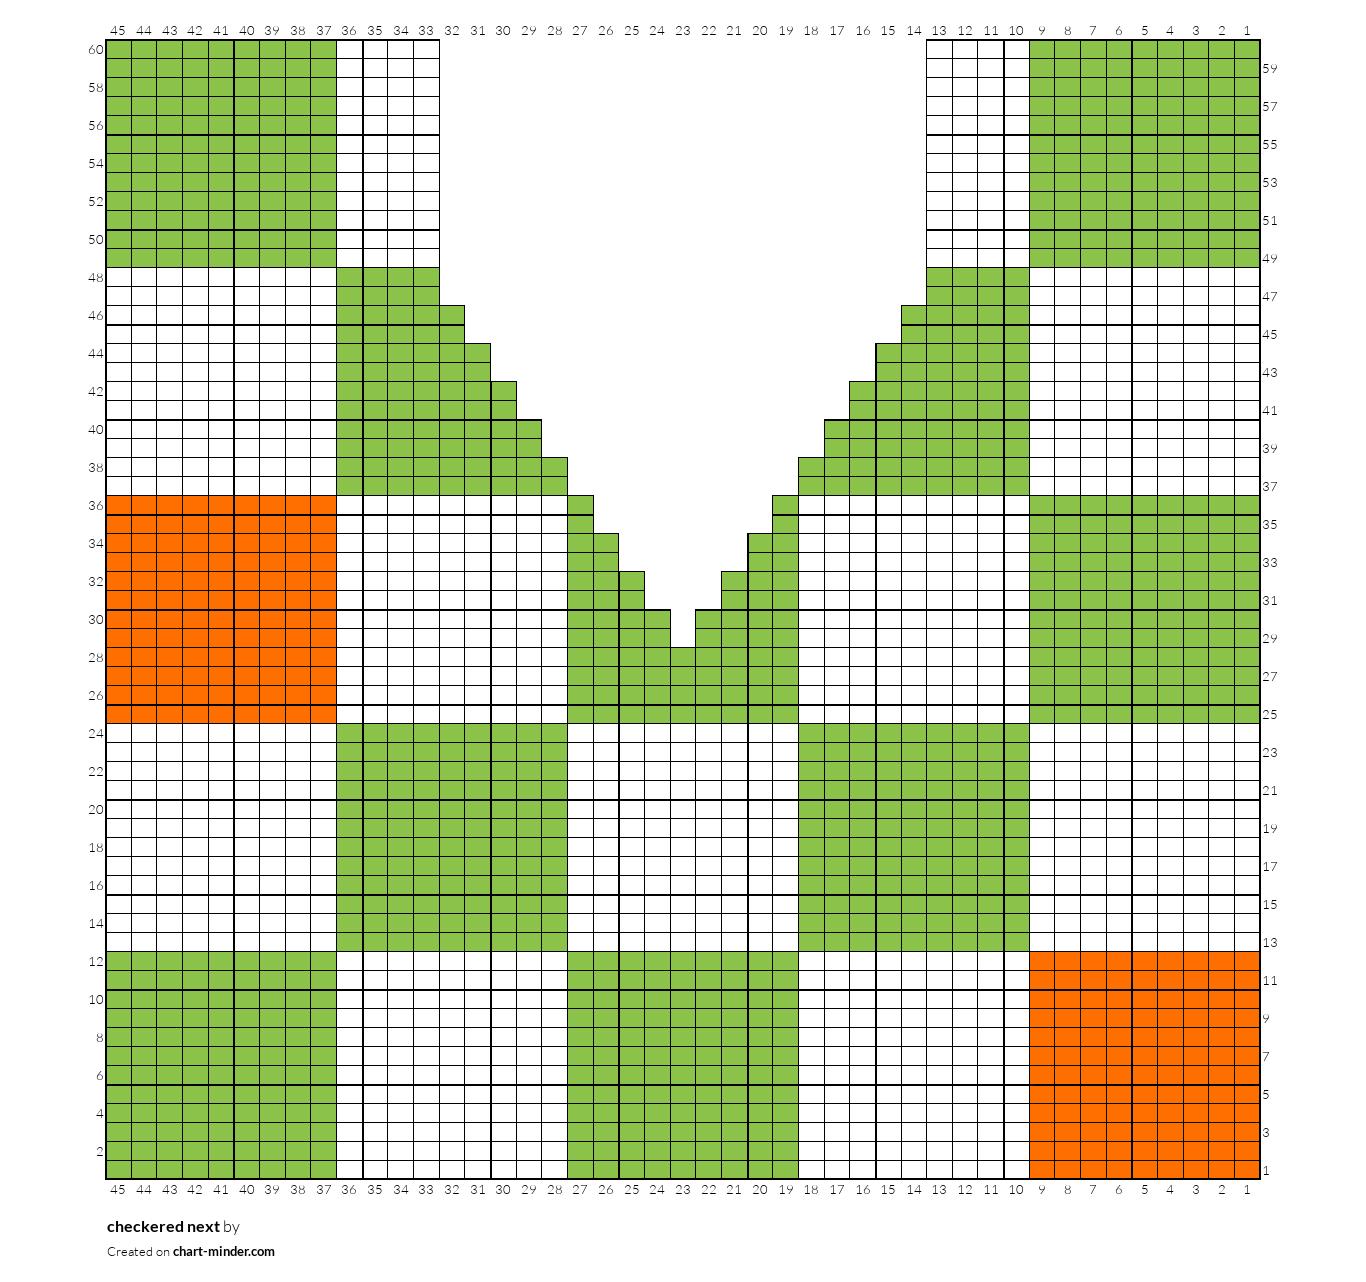 checkered next